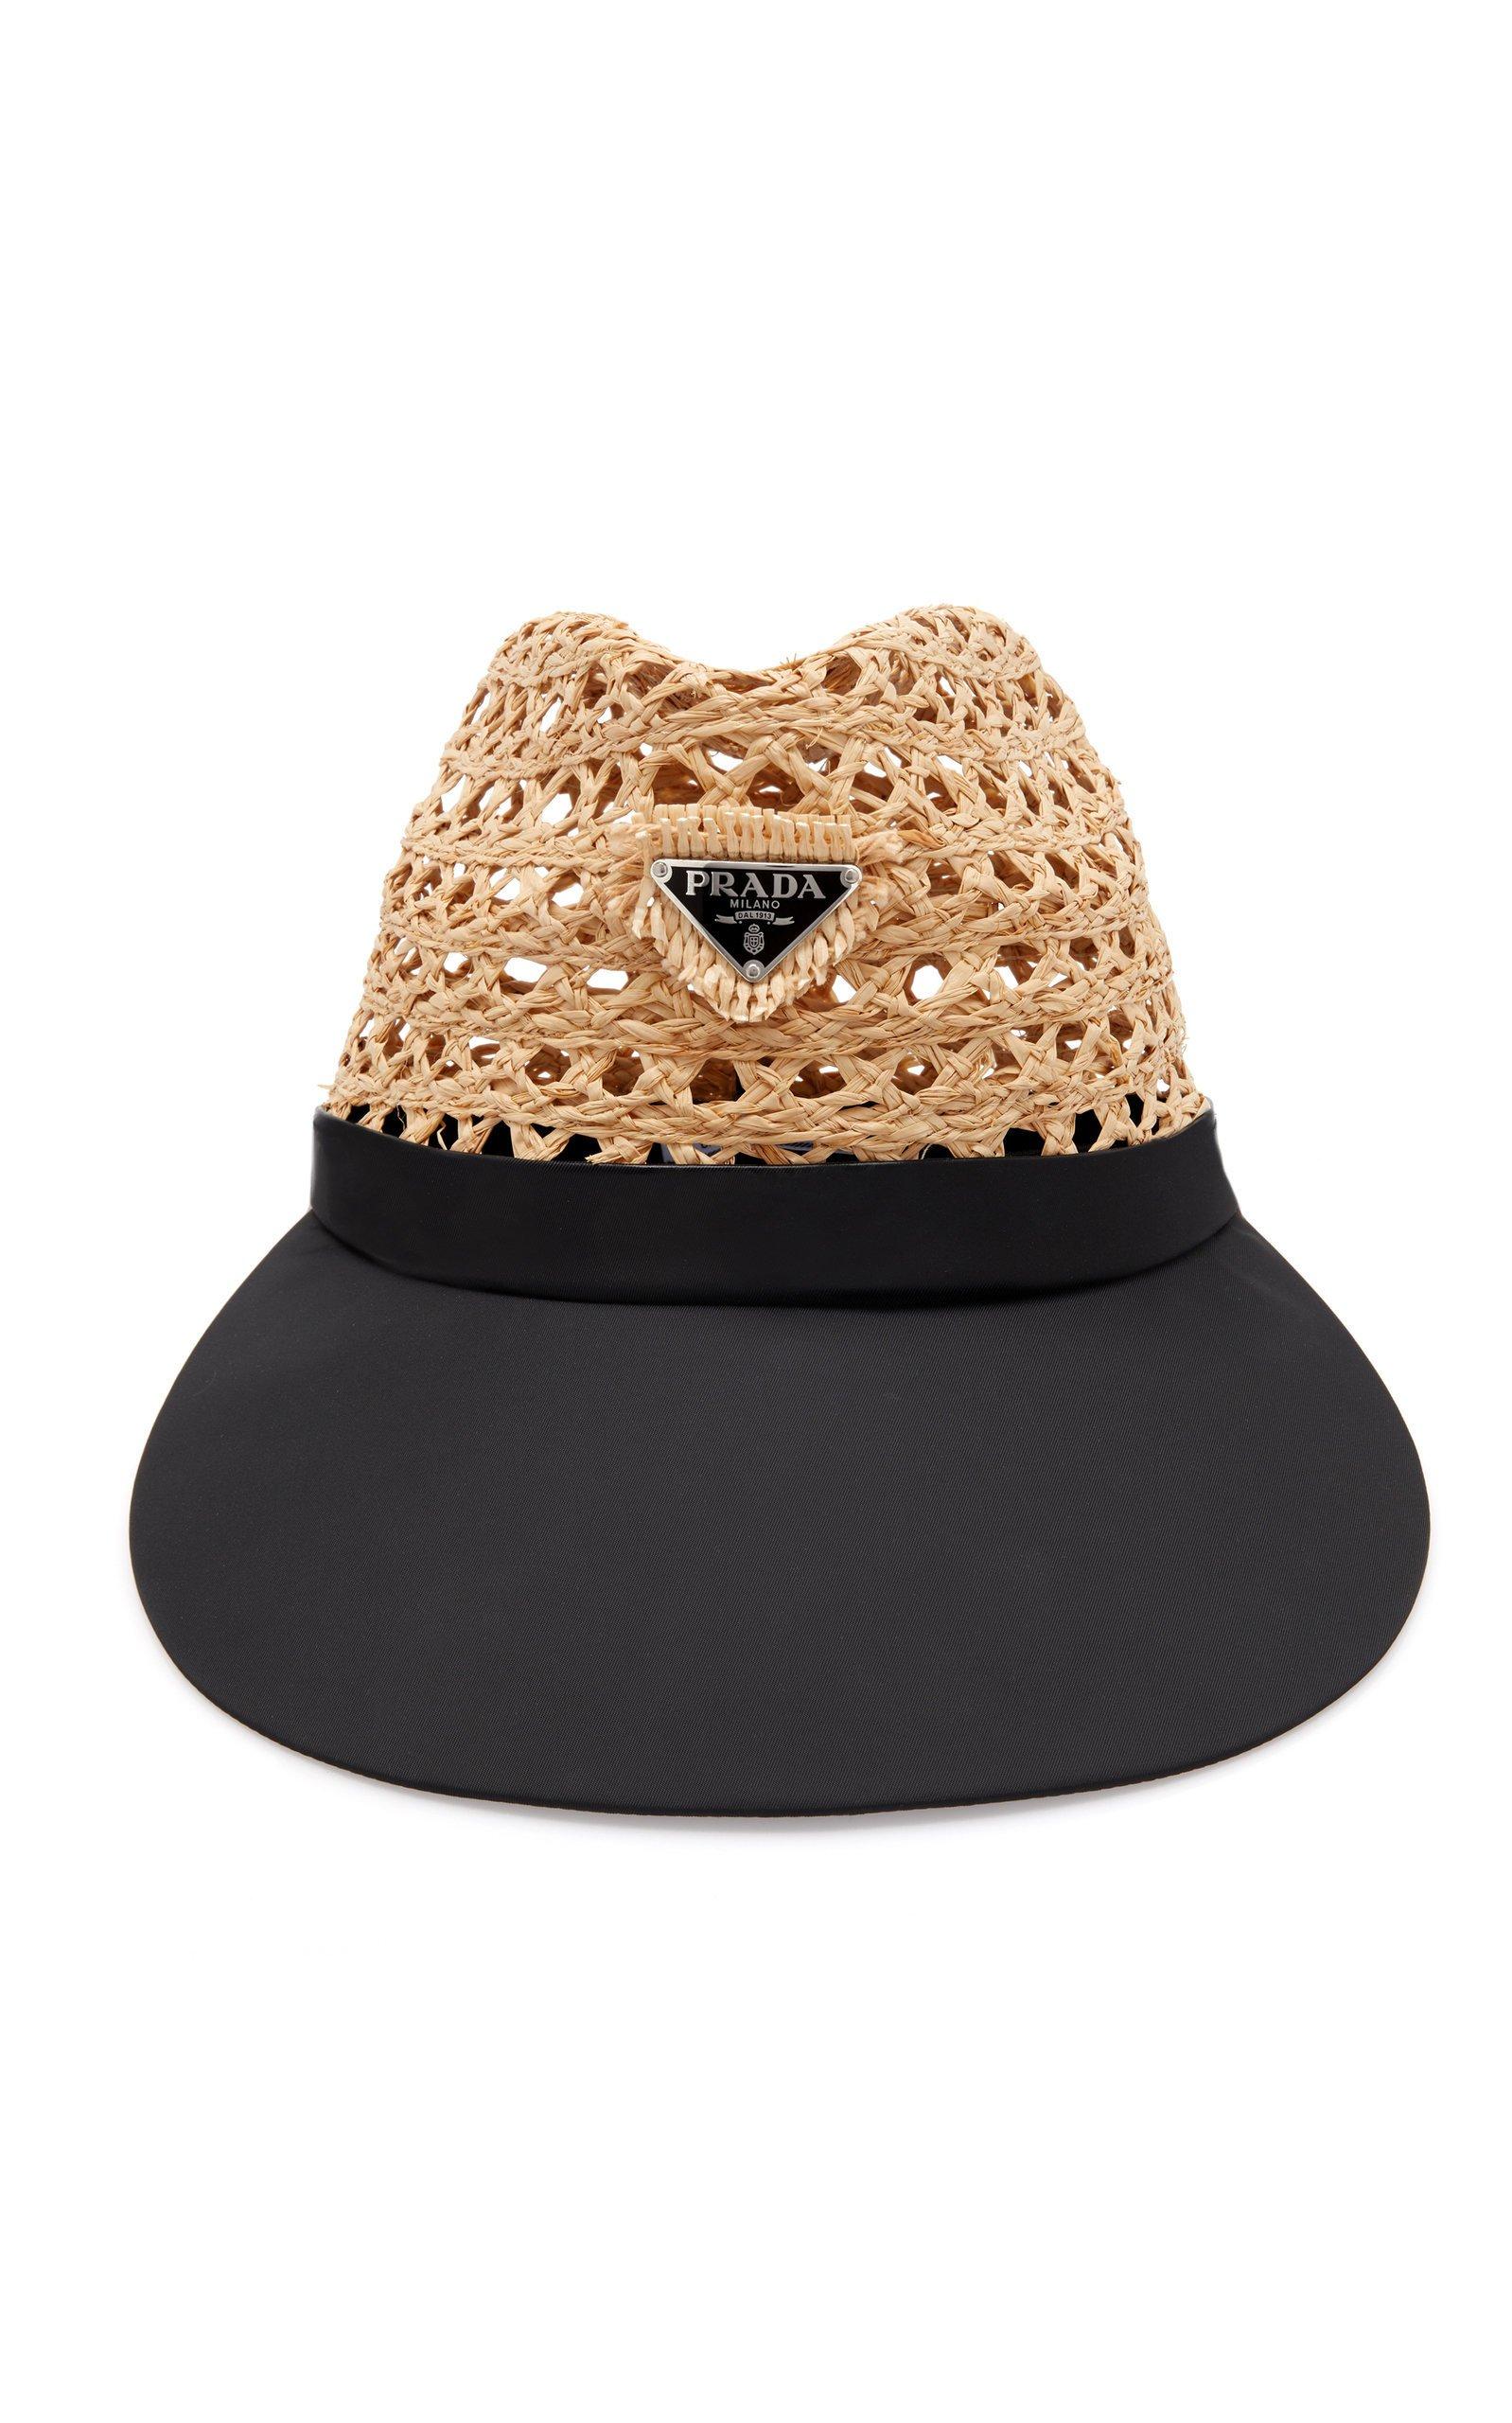 Prada Triangolo Raffia Hat Size: L